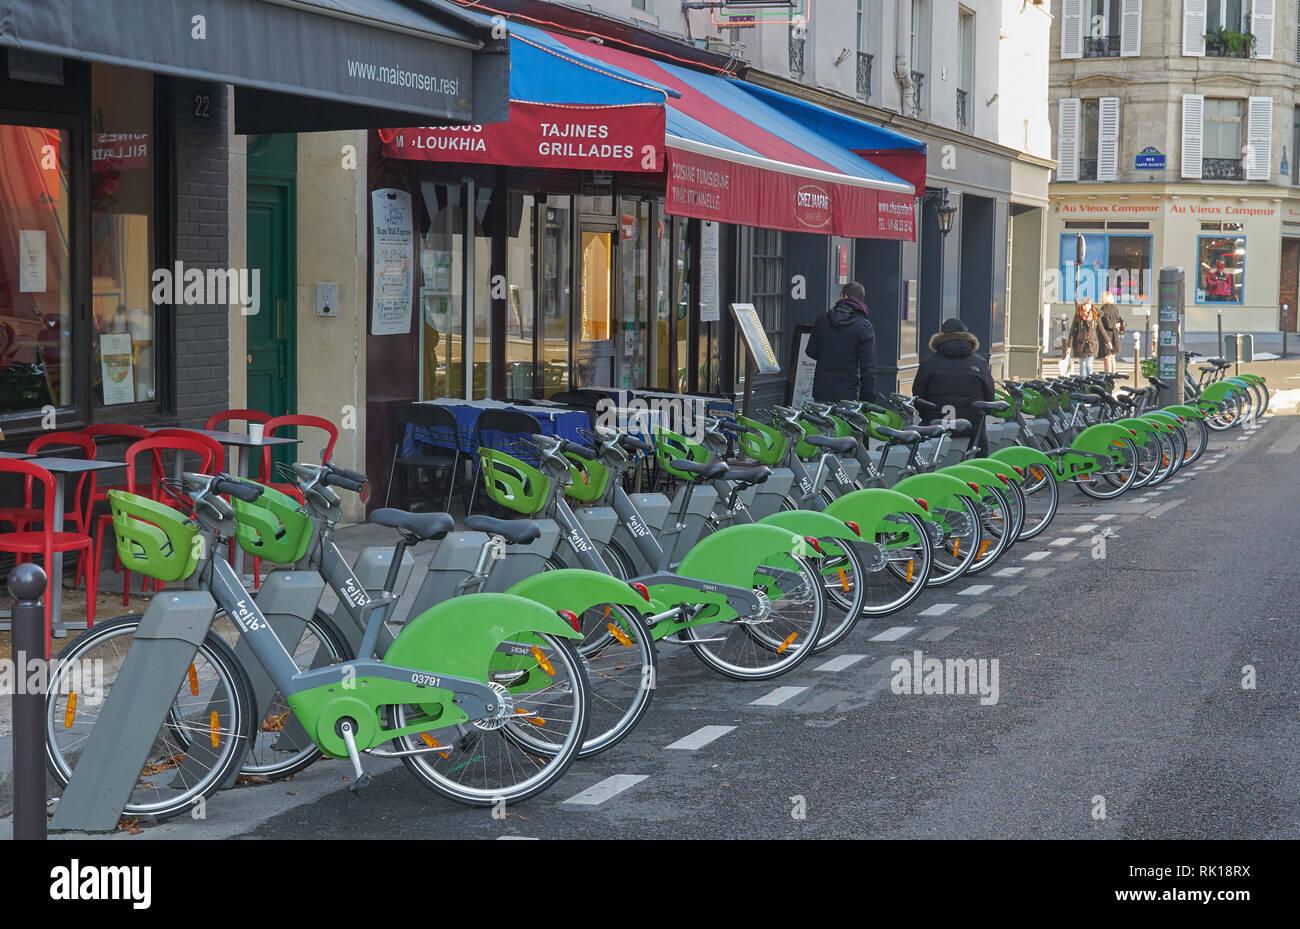 bike hire scheme paris  velib bike paris Stock Photo